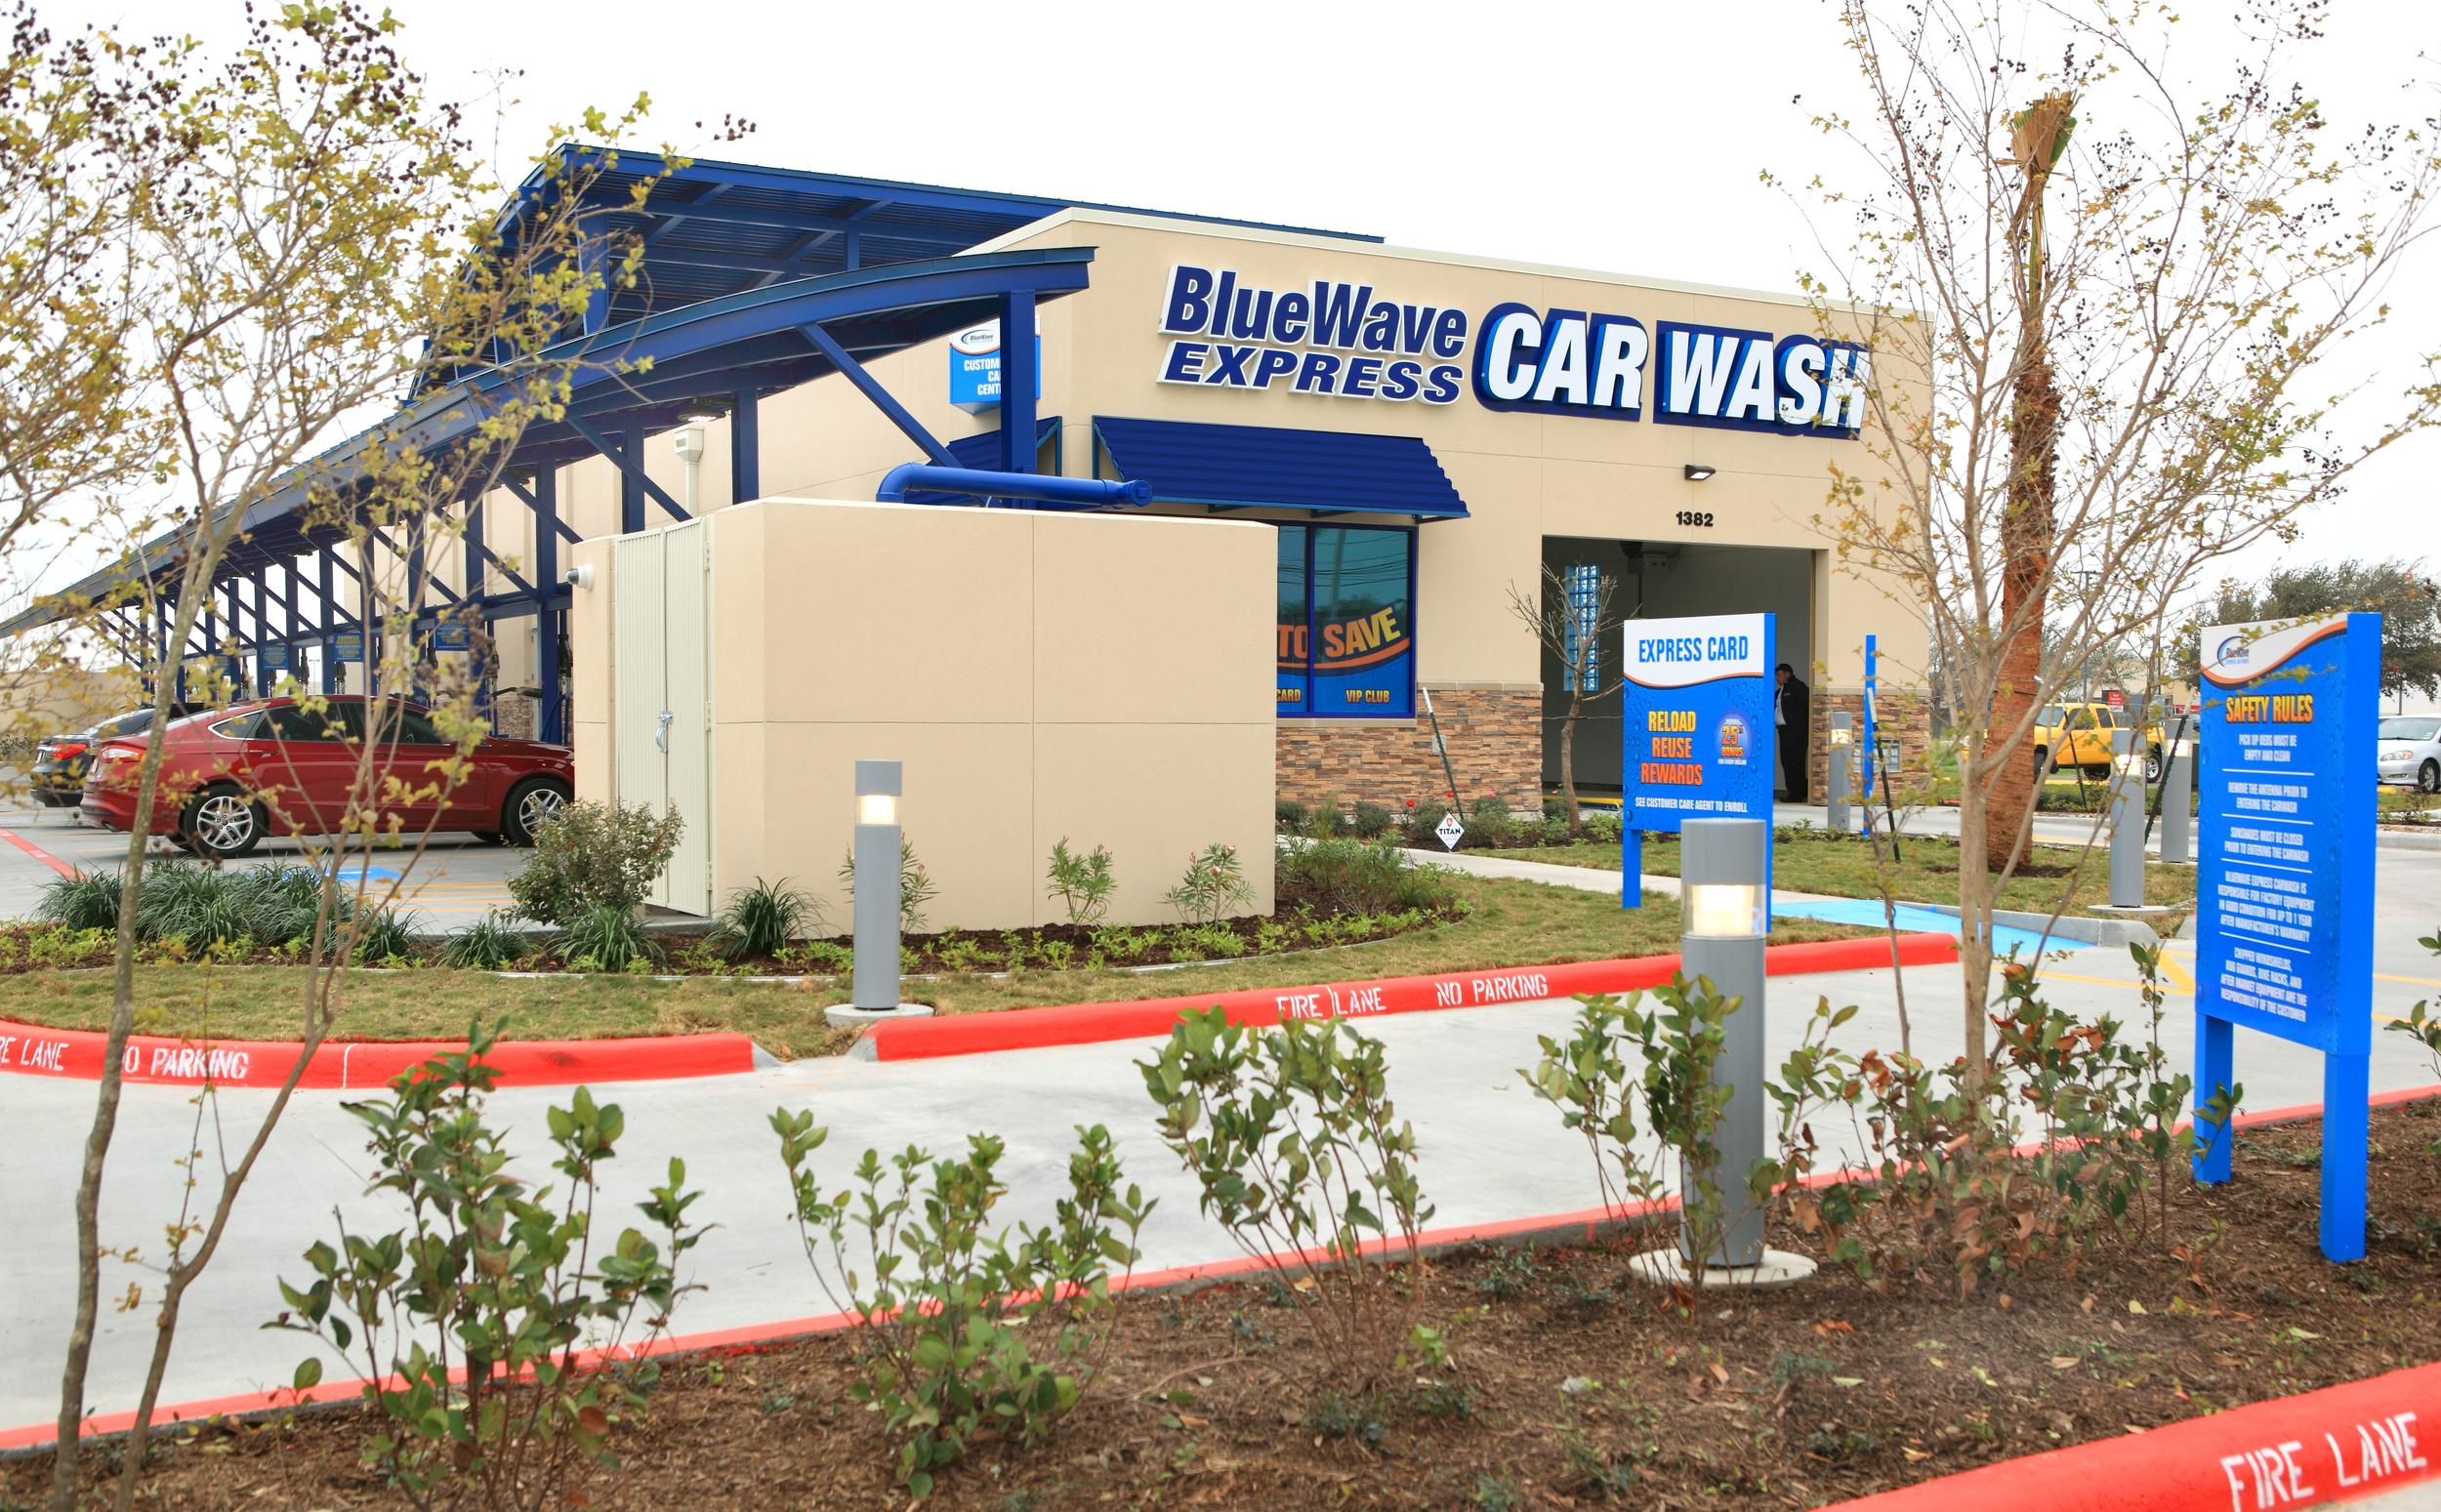 BlueWave Express Car Wash